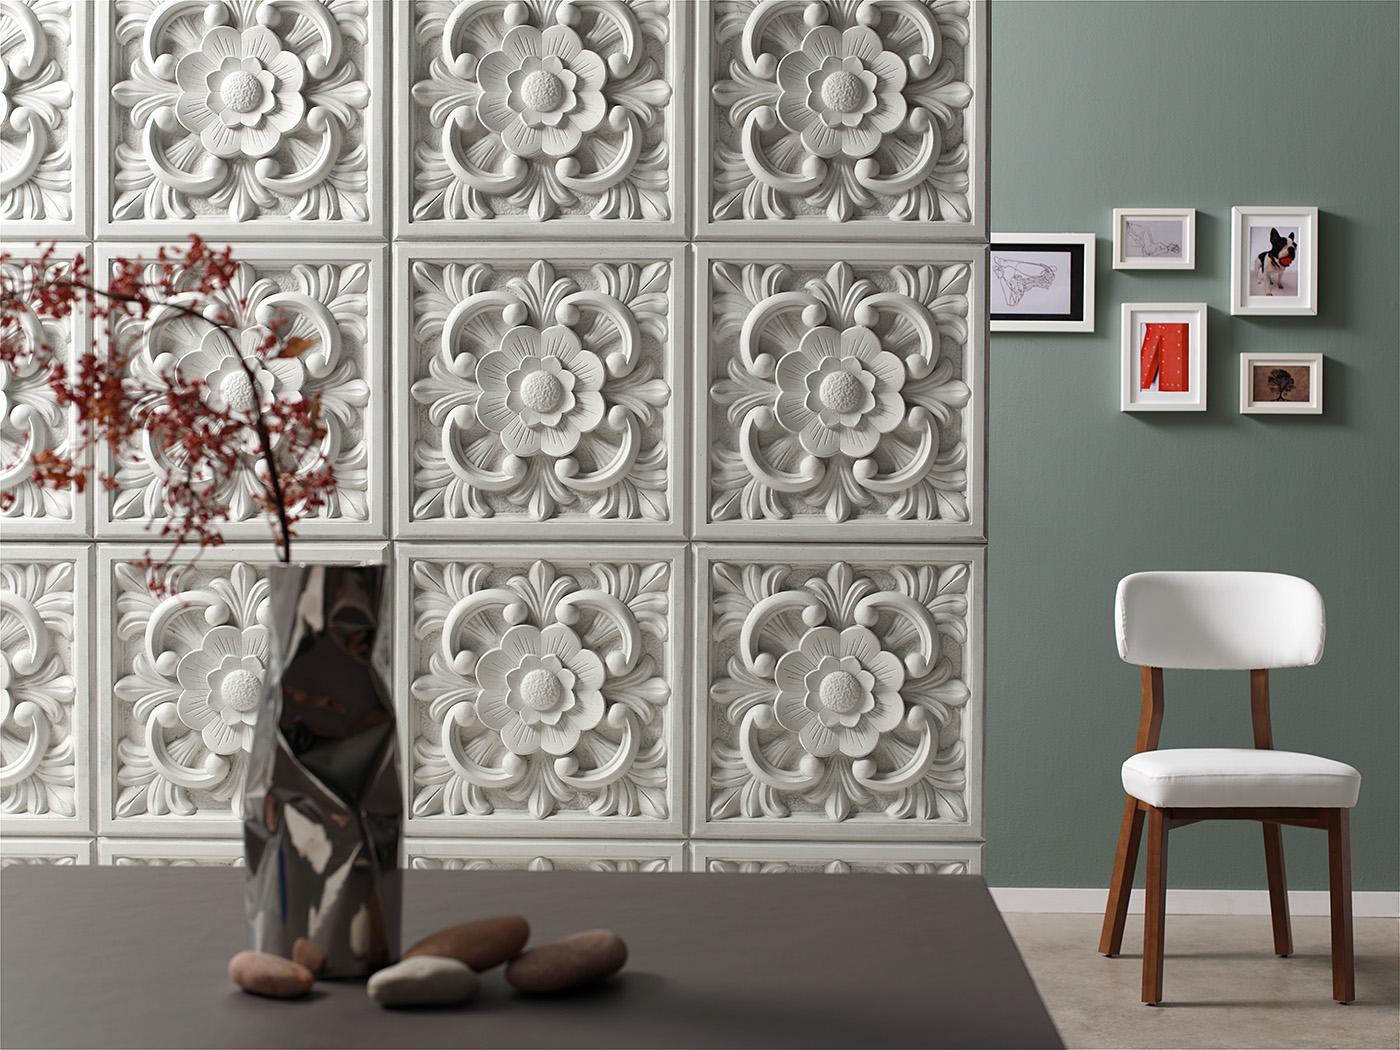 Panel piedra windsur paneles para paredes vintage - Paneles decorativos de piedra ...